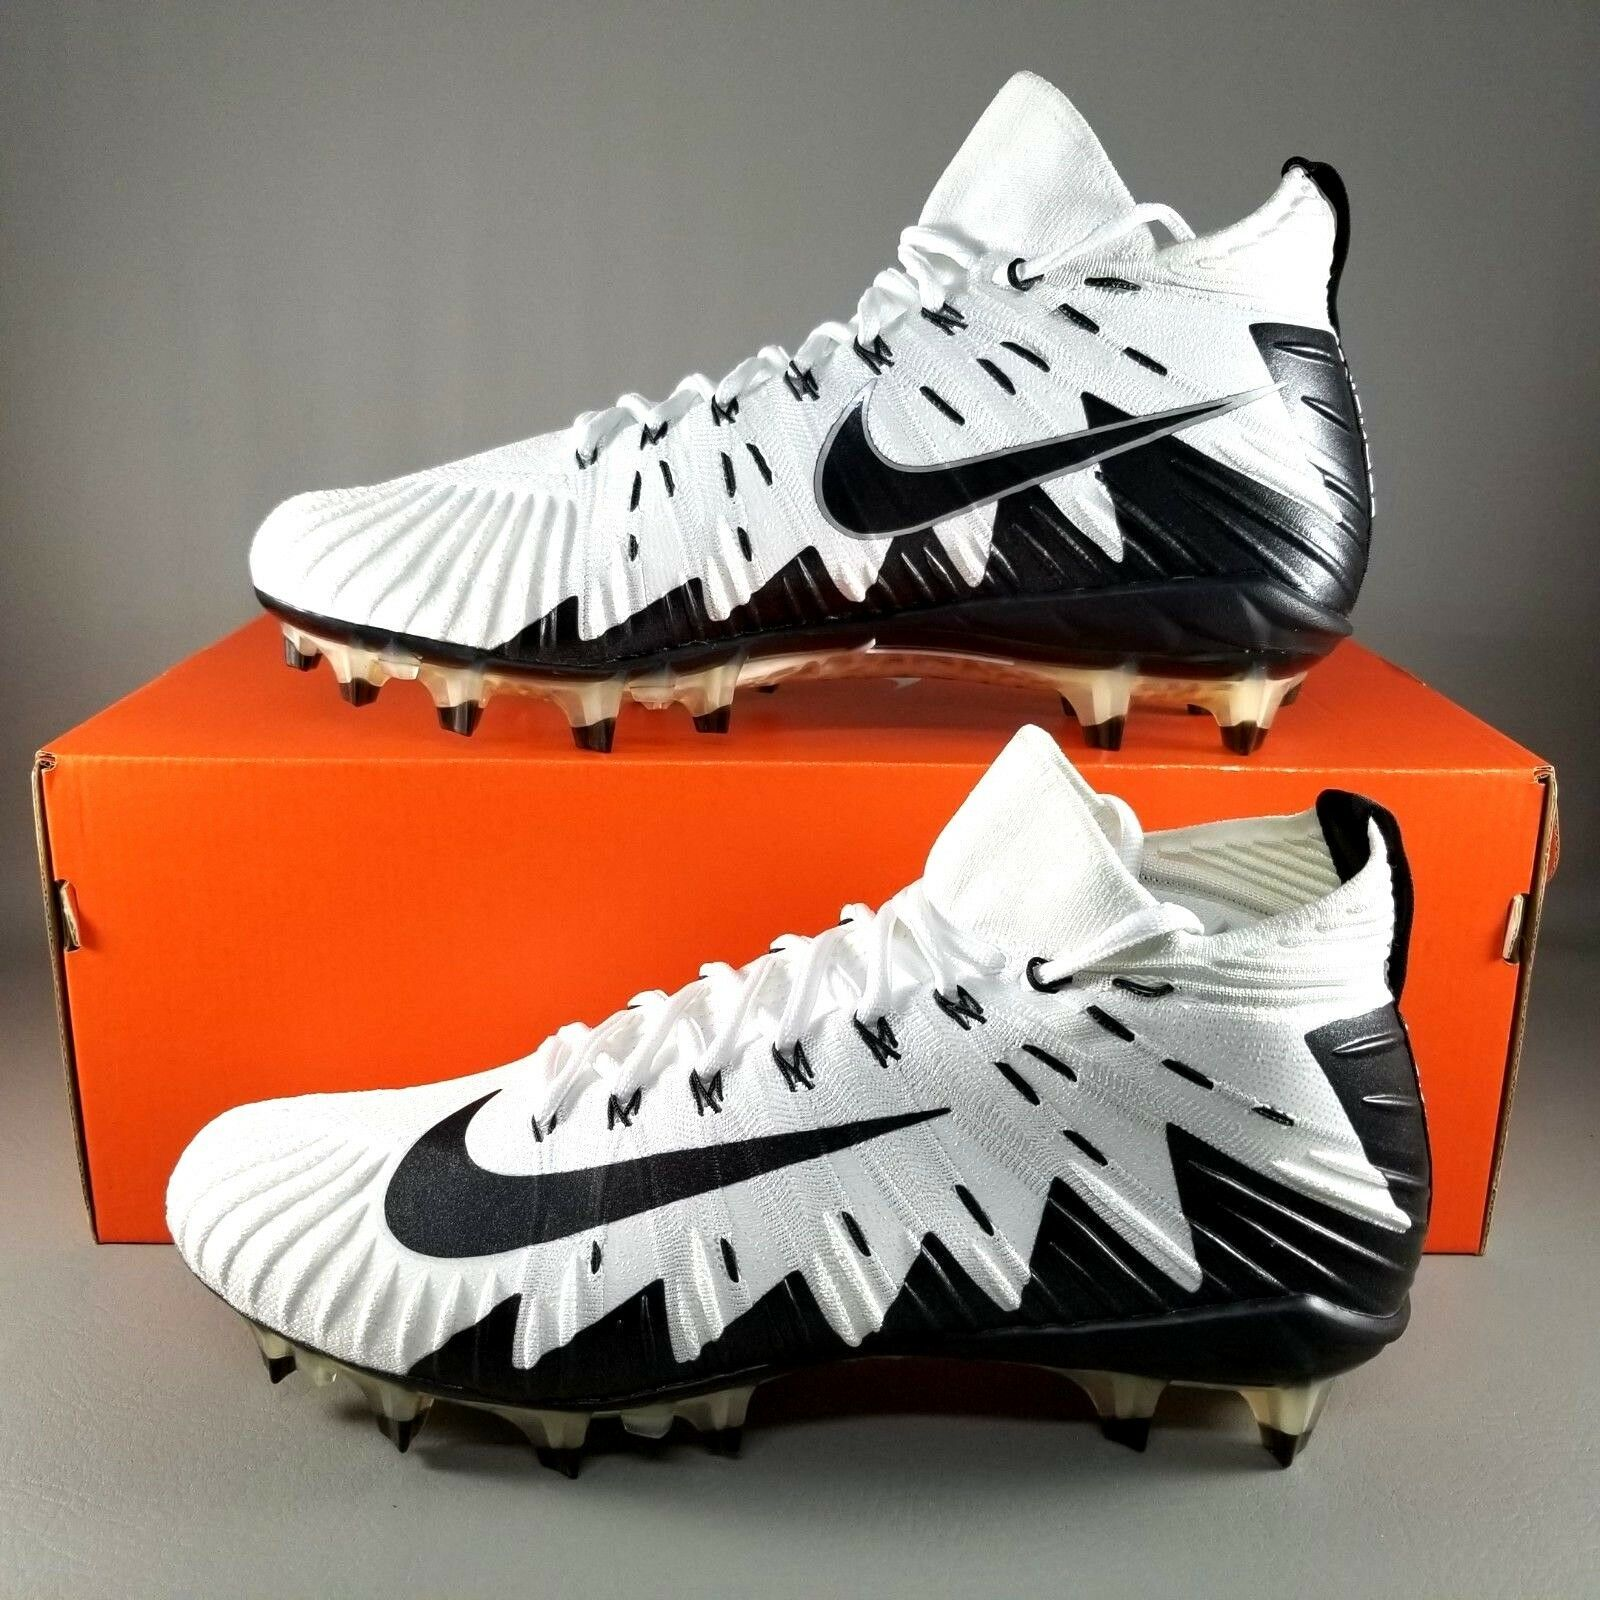 3e1472d25e5 Nike Alpha Menace Elite Size 11.5 Football and 32 similar items